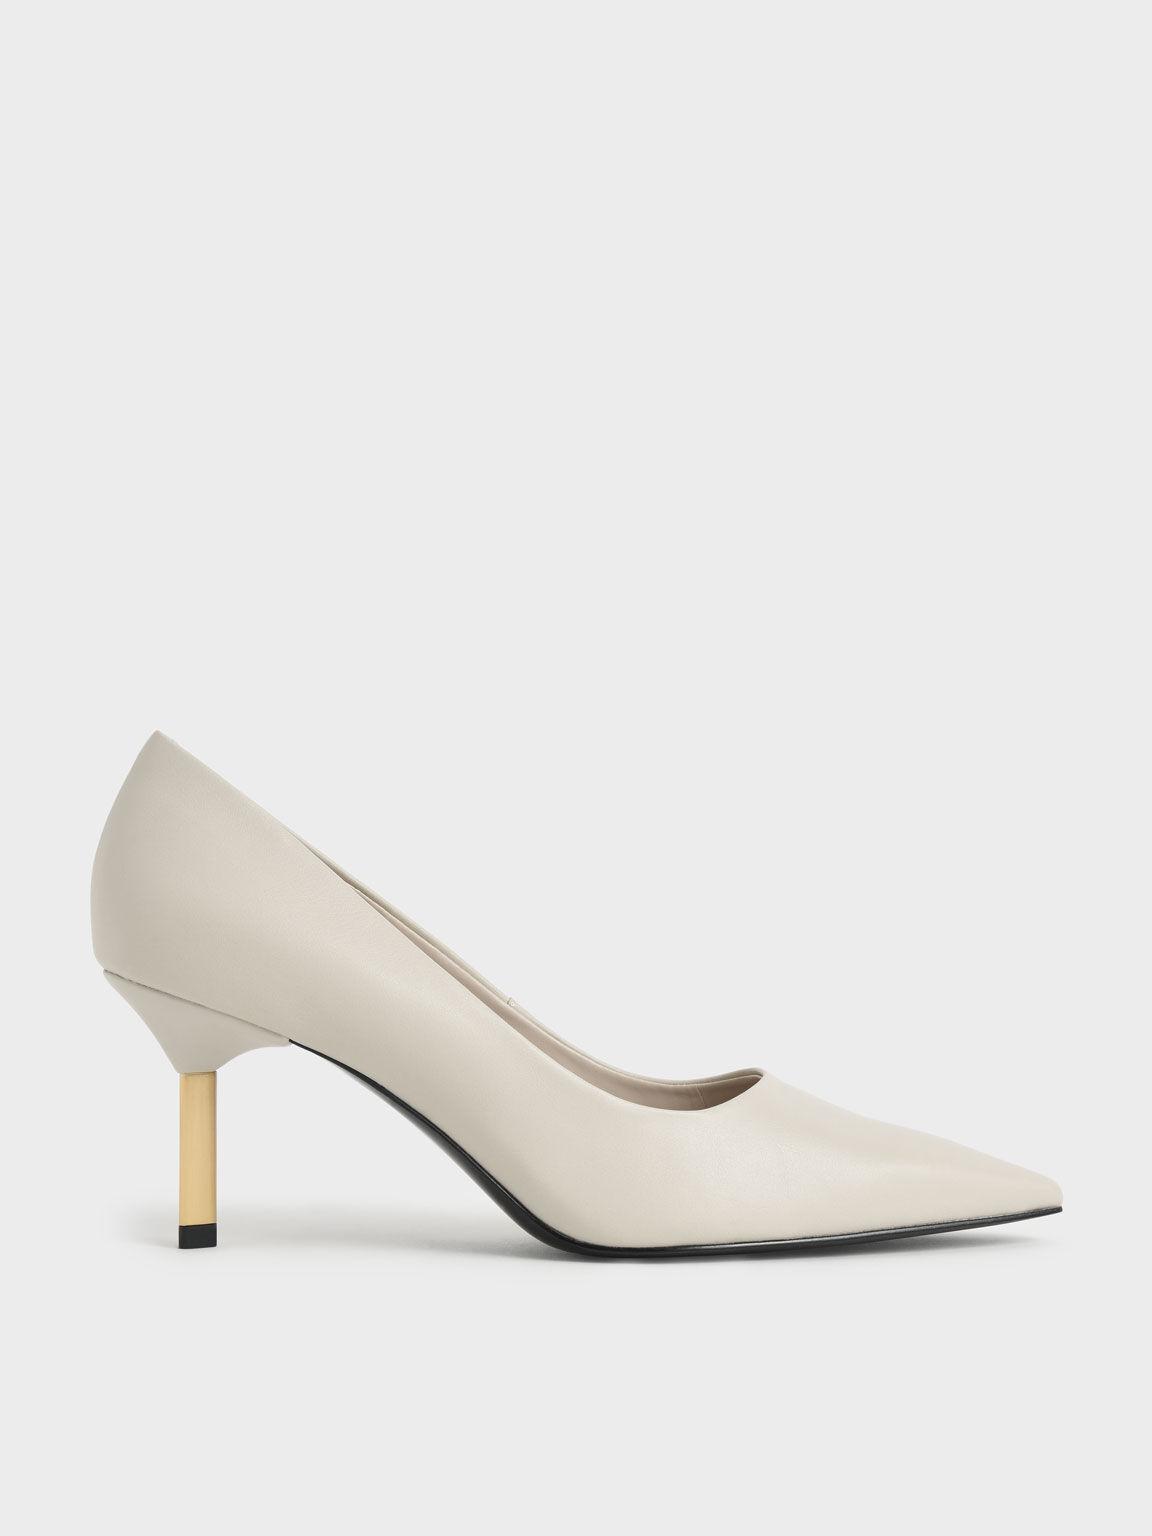 Sepatu Metallic Stiletto Heel Pumps, Chalk, hi-res